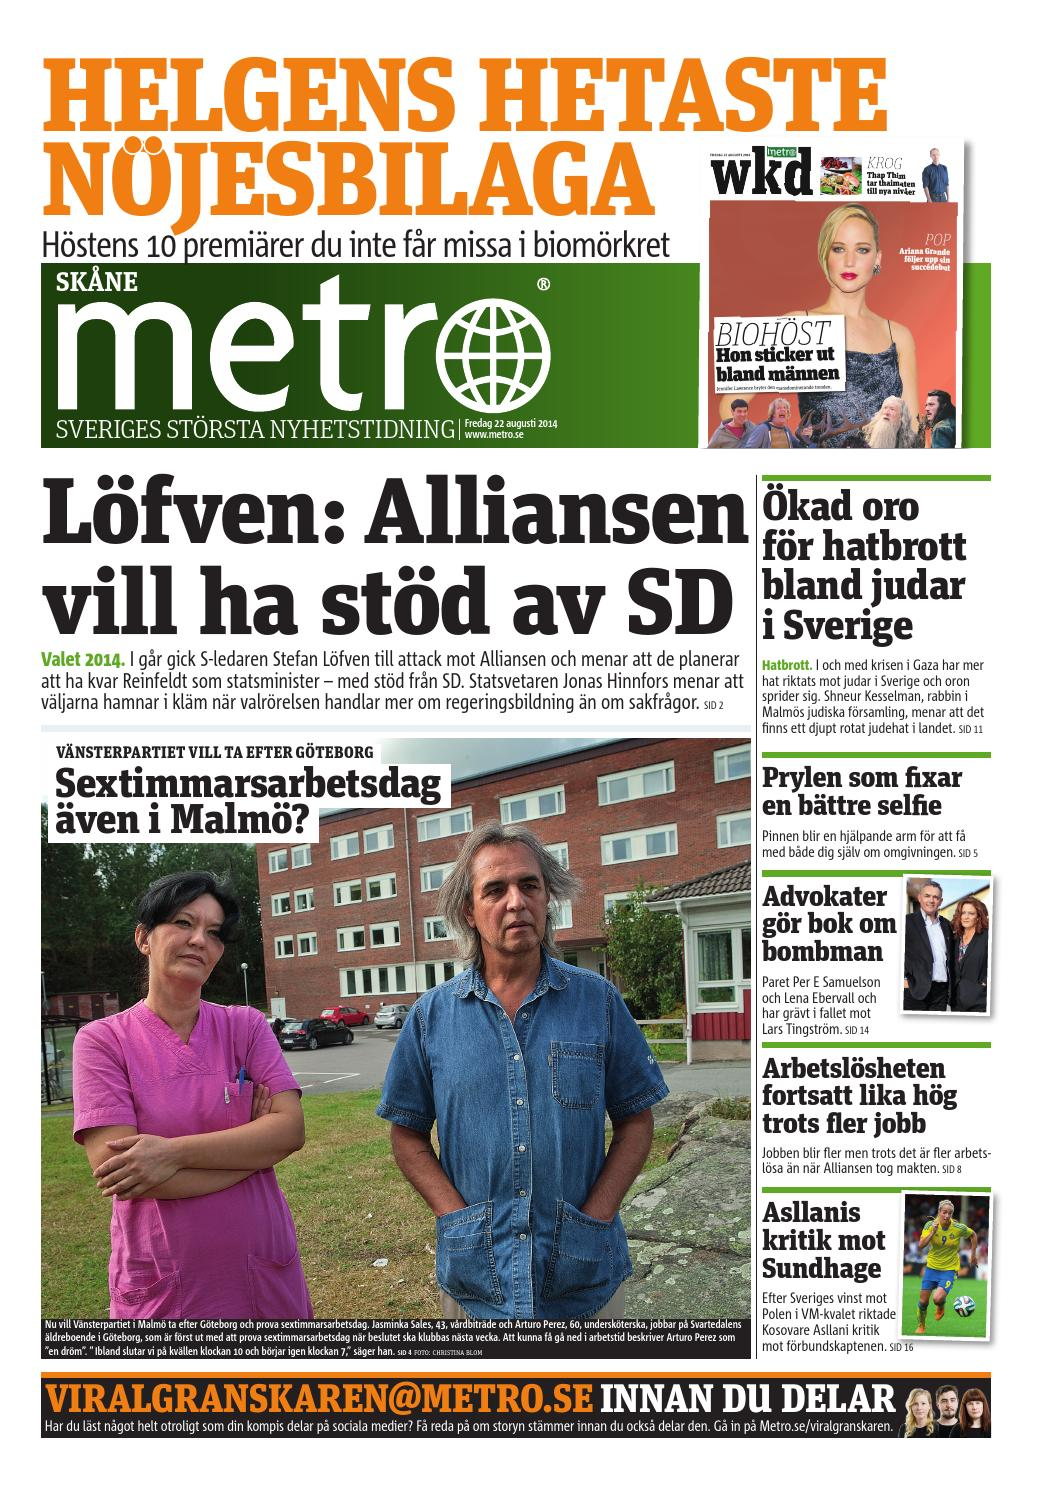 Sveriges radio stammer kinnevik